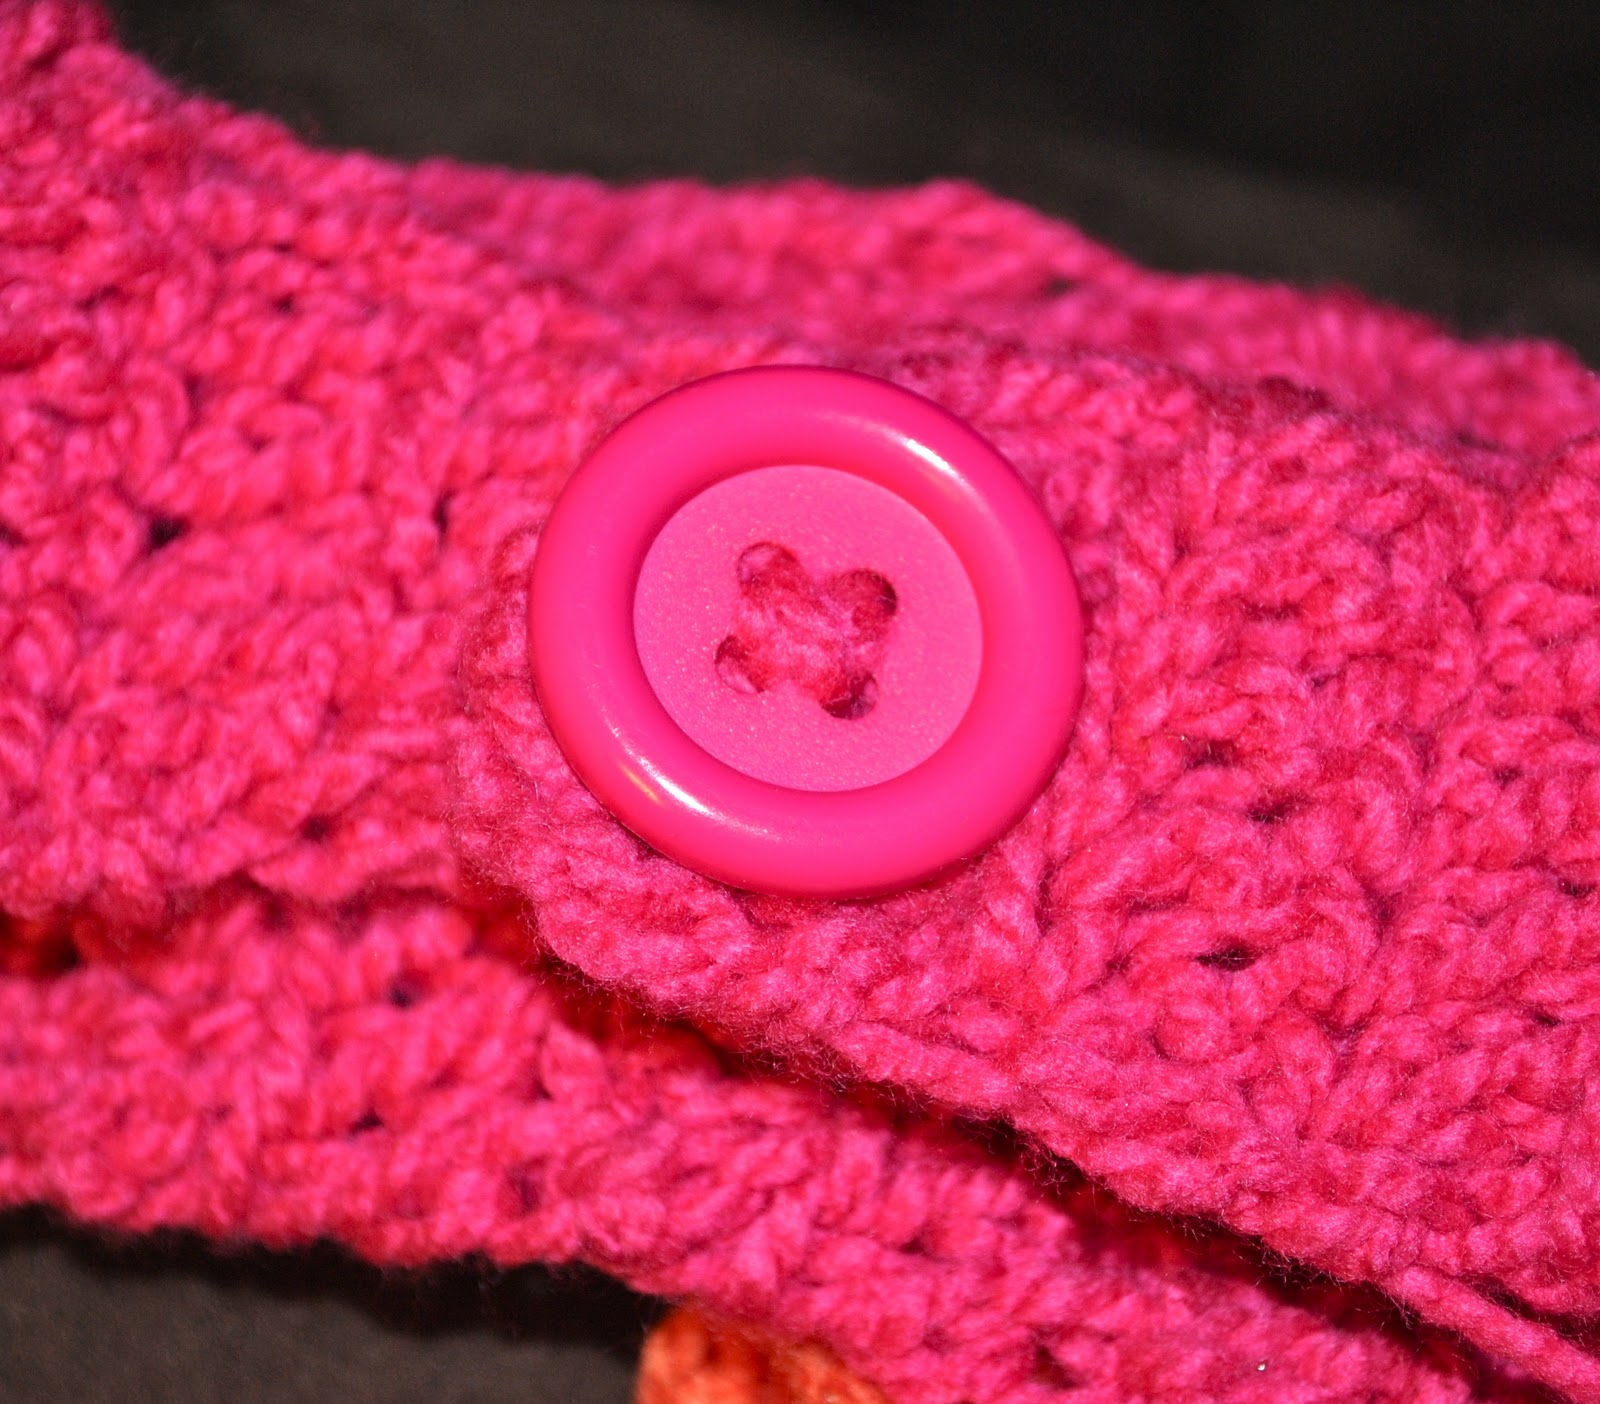 CROCHET FLOWER HEADBAND PATTERN Crochet Patterns